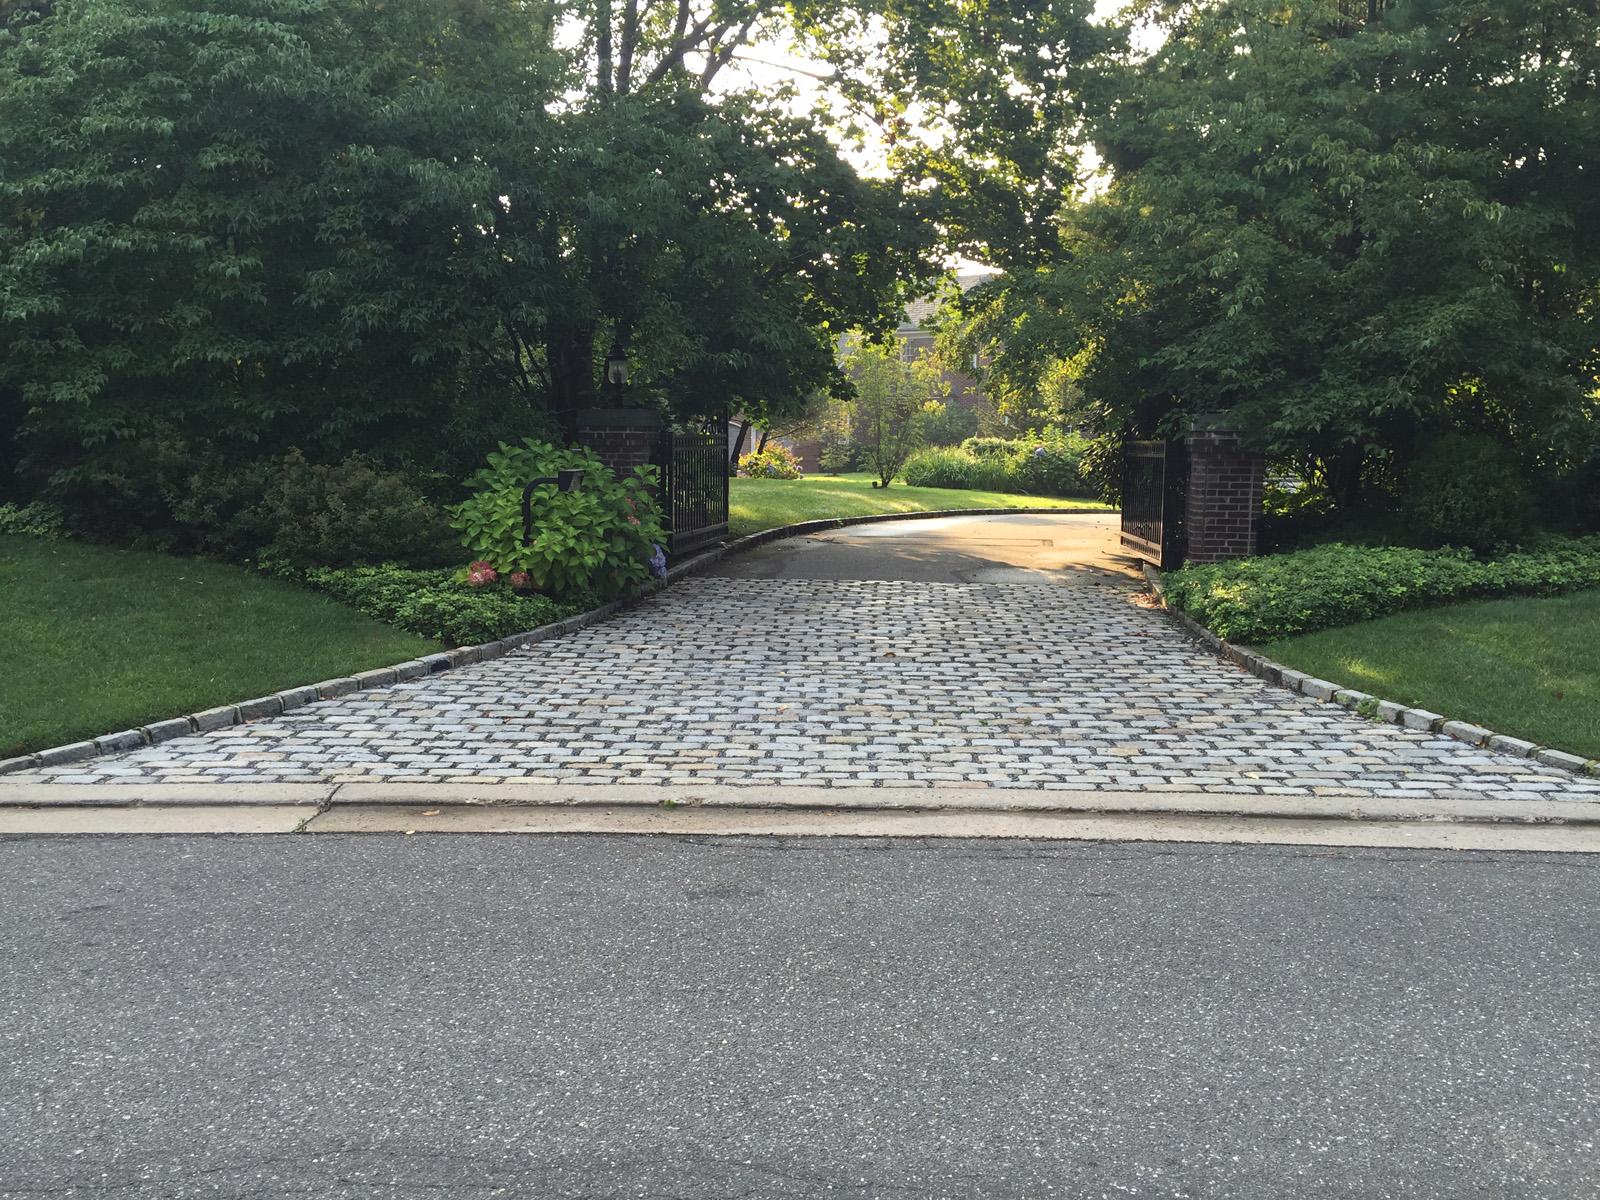 Professional unilock paver company in Long Island, NY